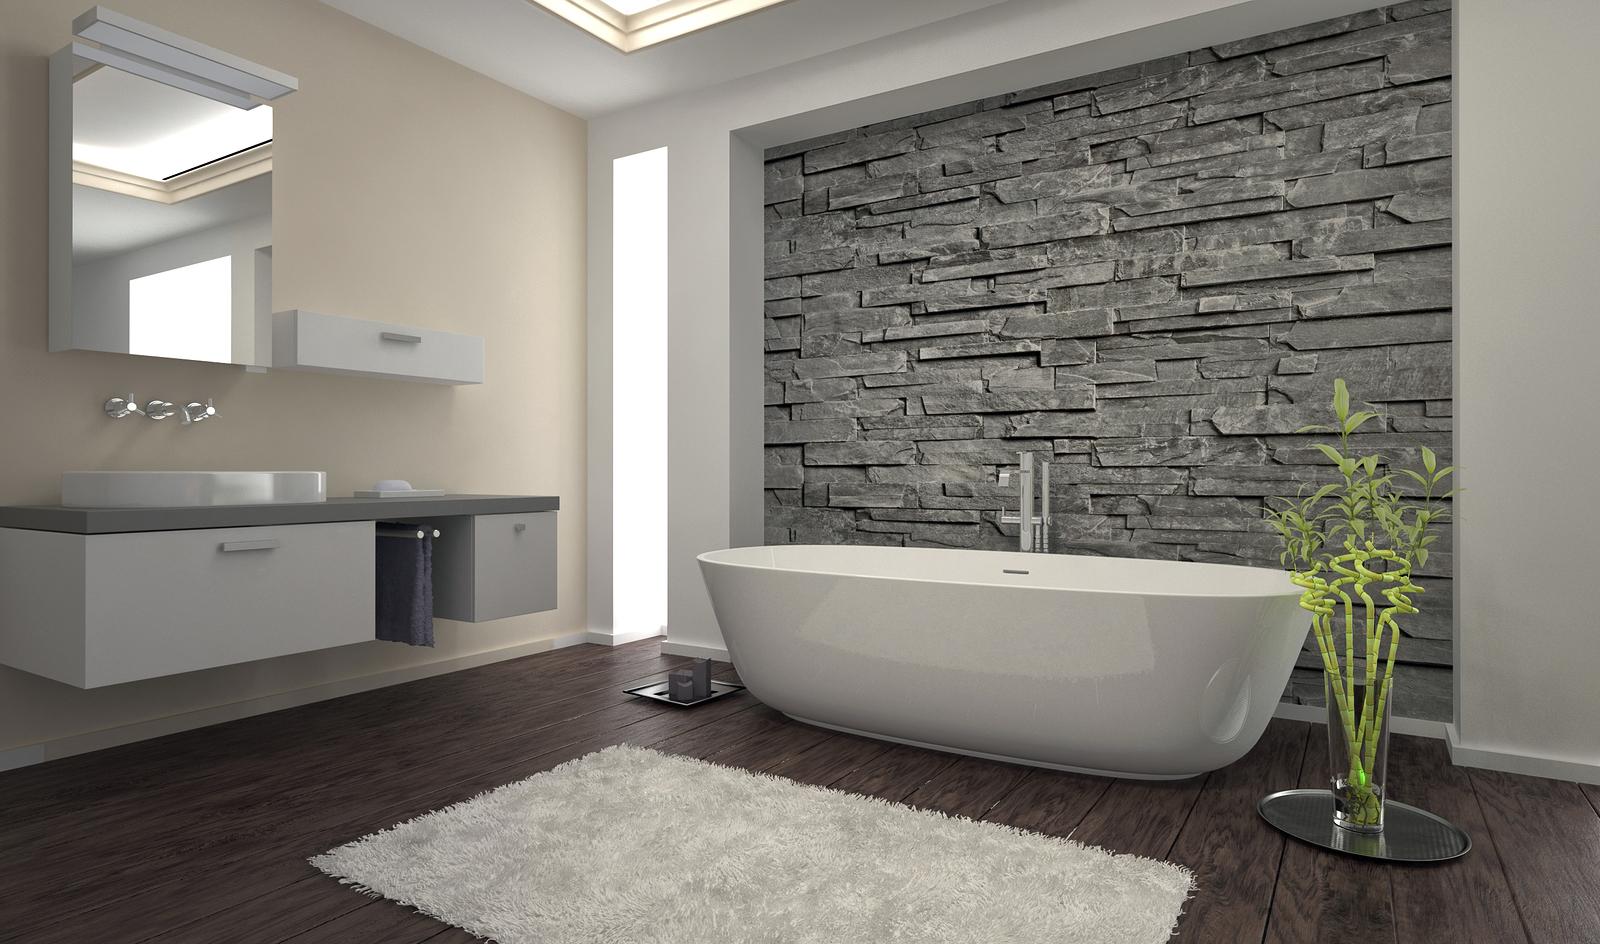 Бело-серая палитра ванной комнаты